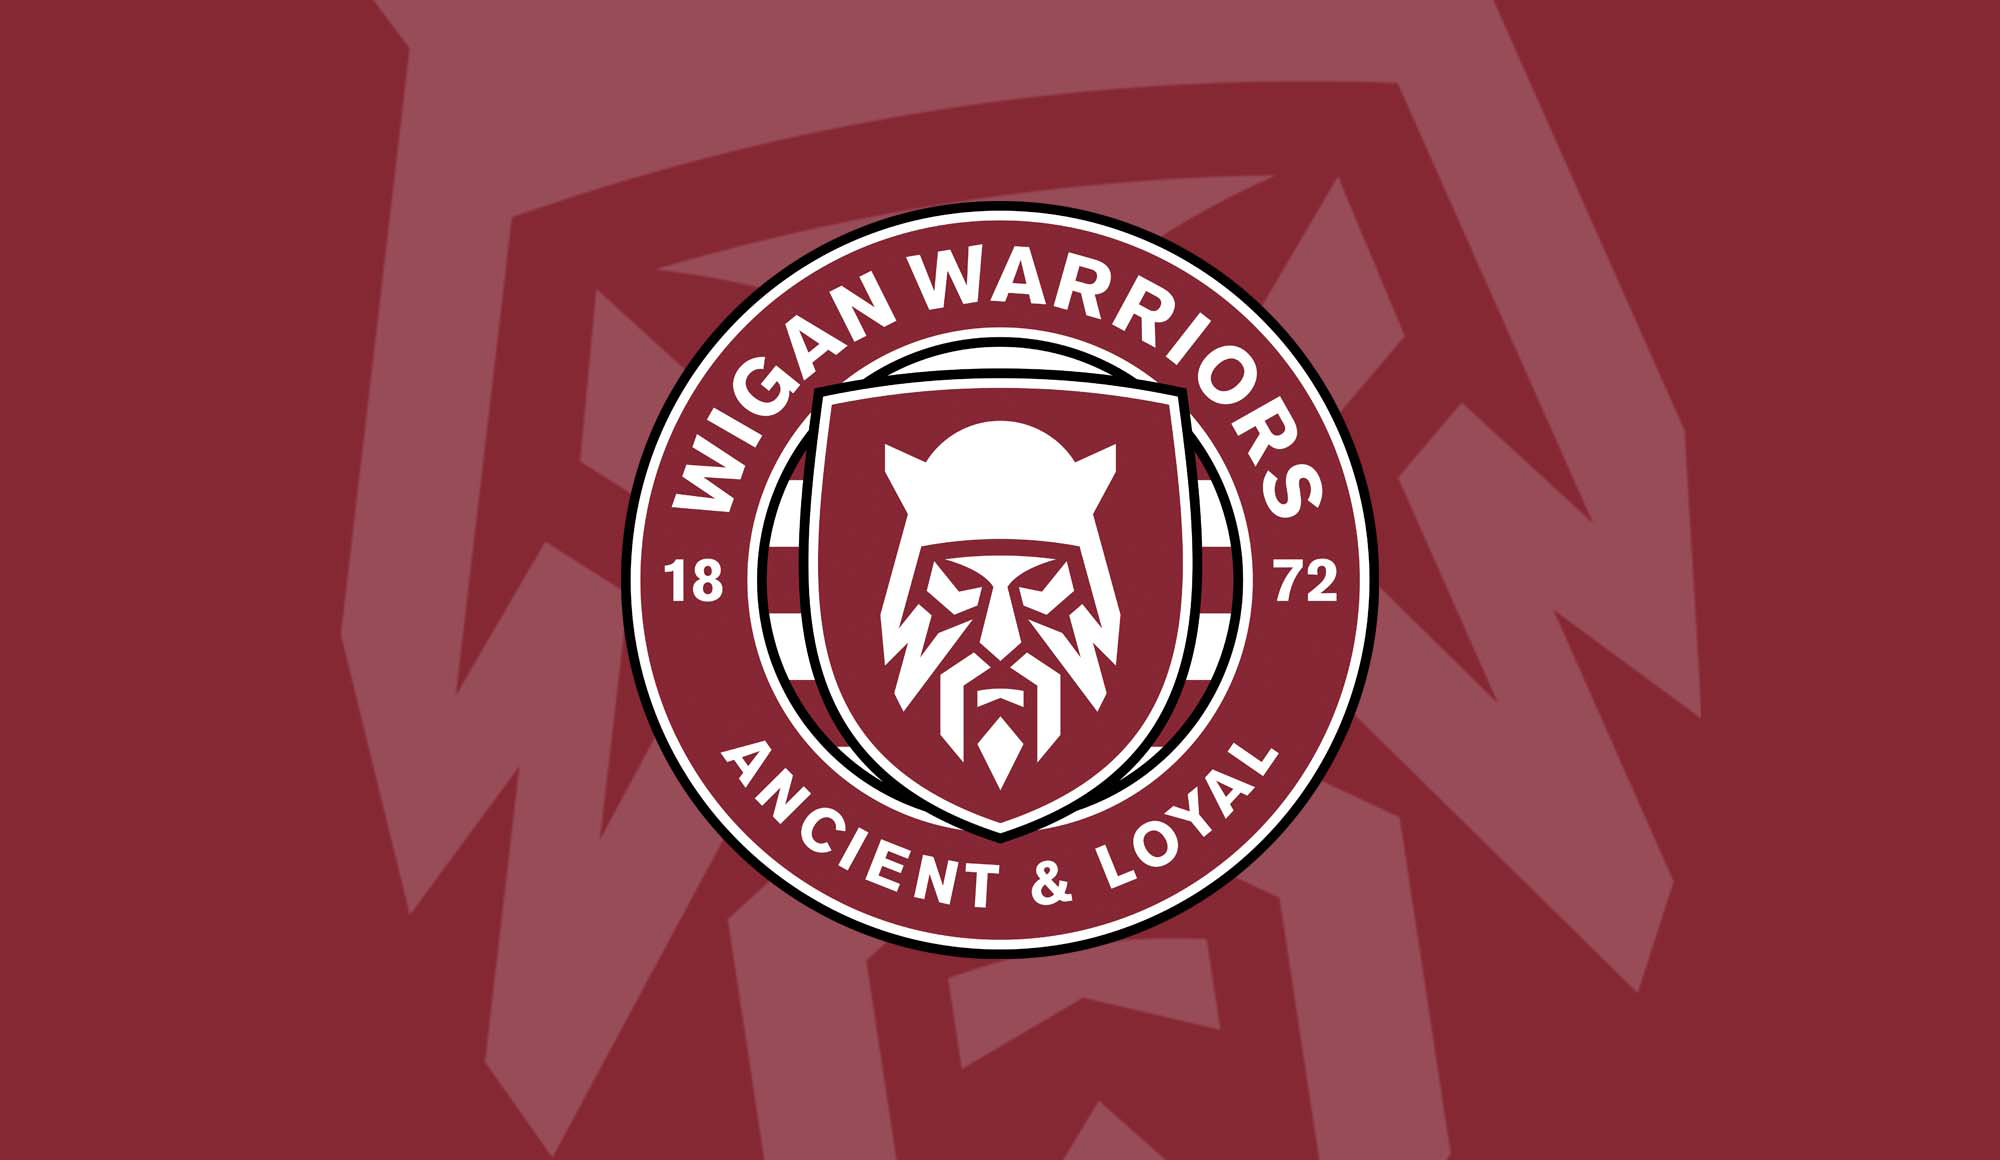 Wigan Warriors new logo